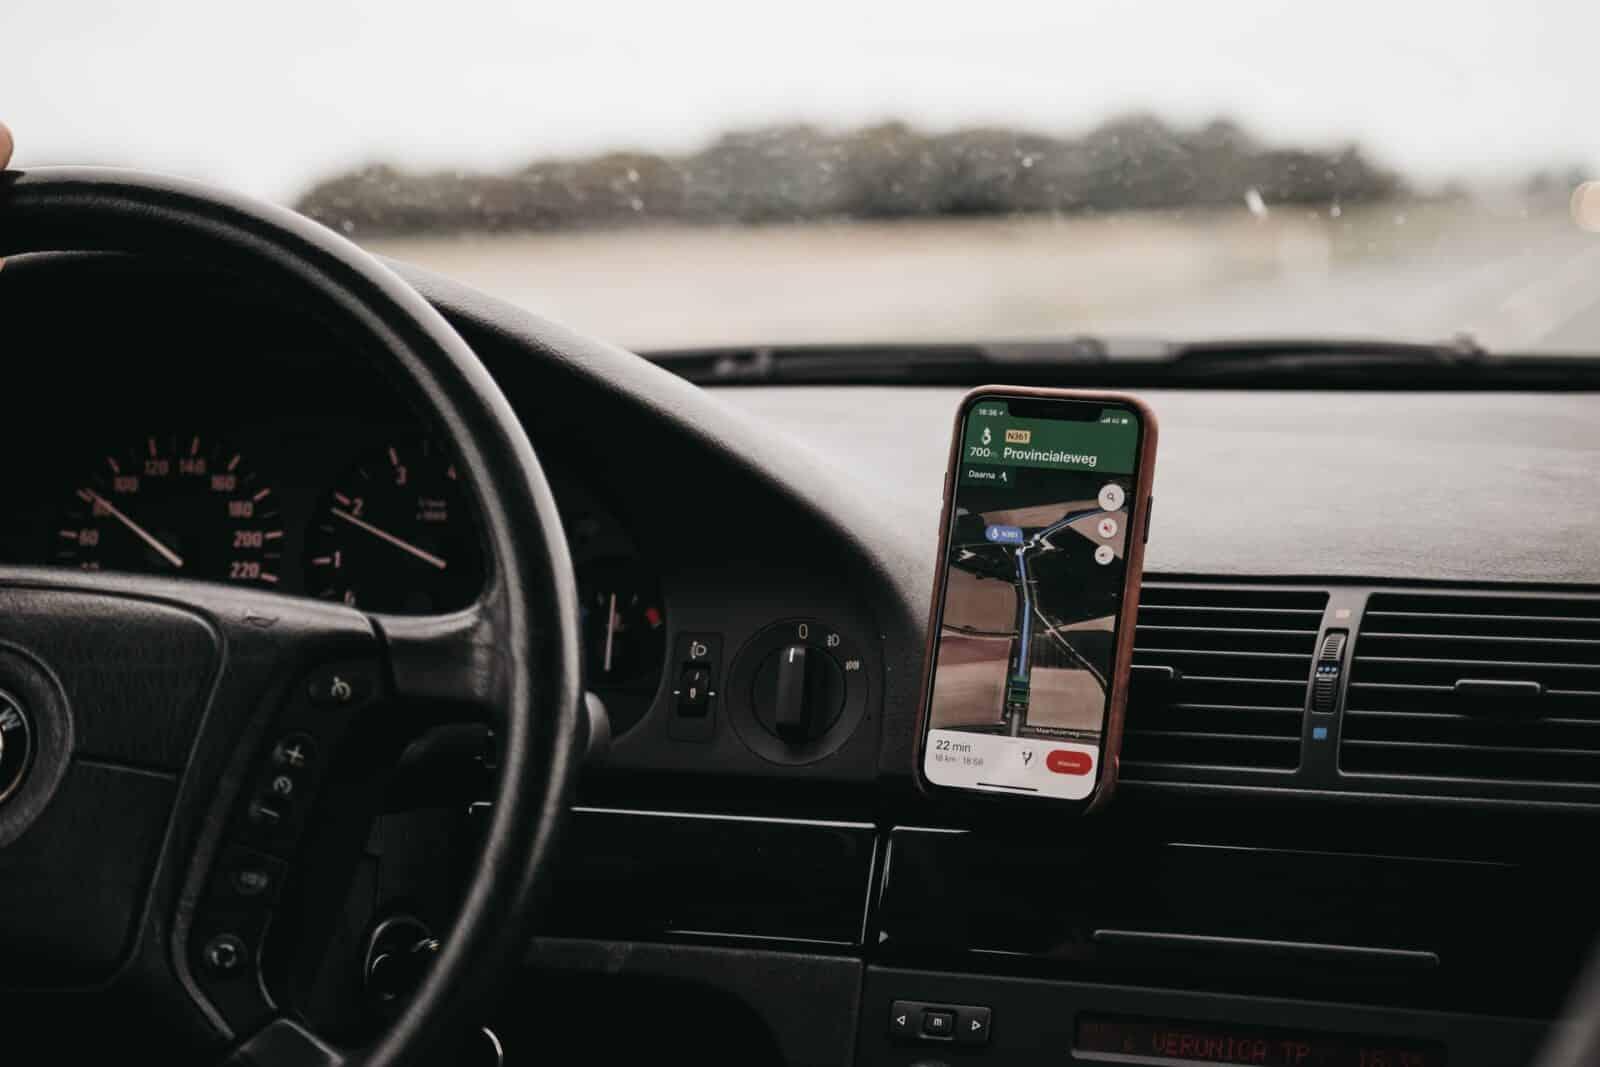 maps-android-auto-desactiver-ok-google